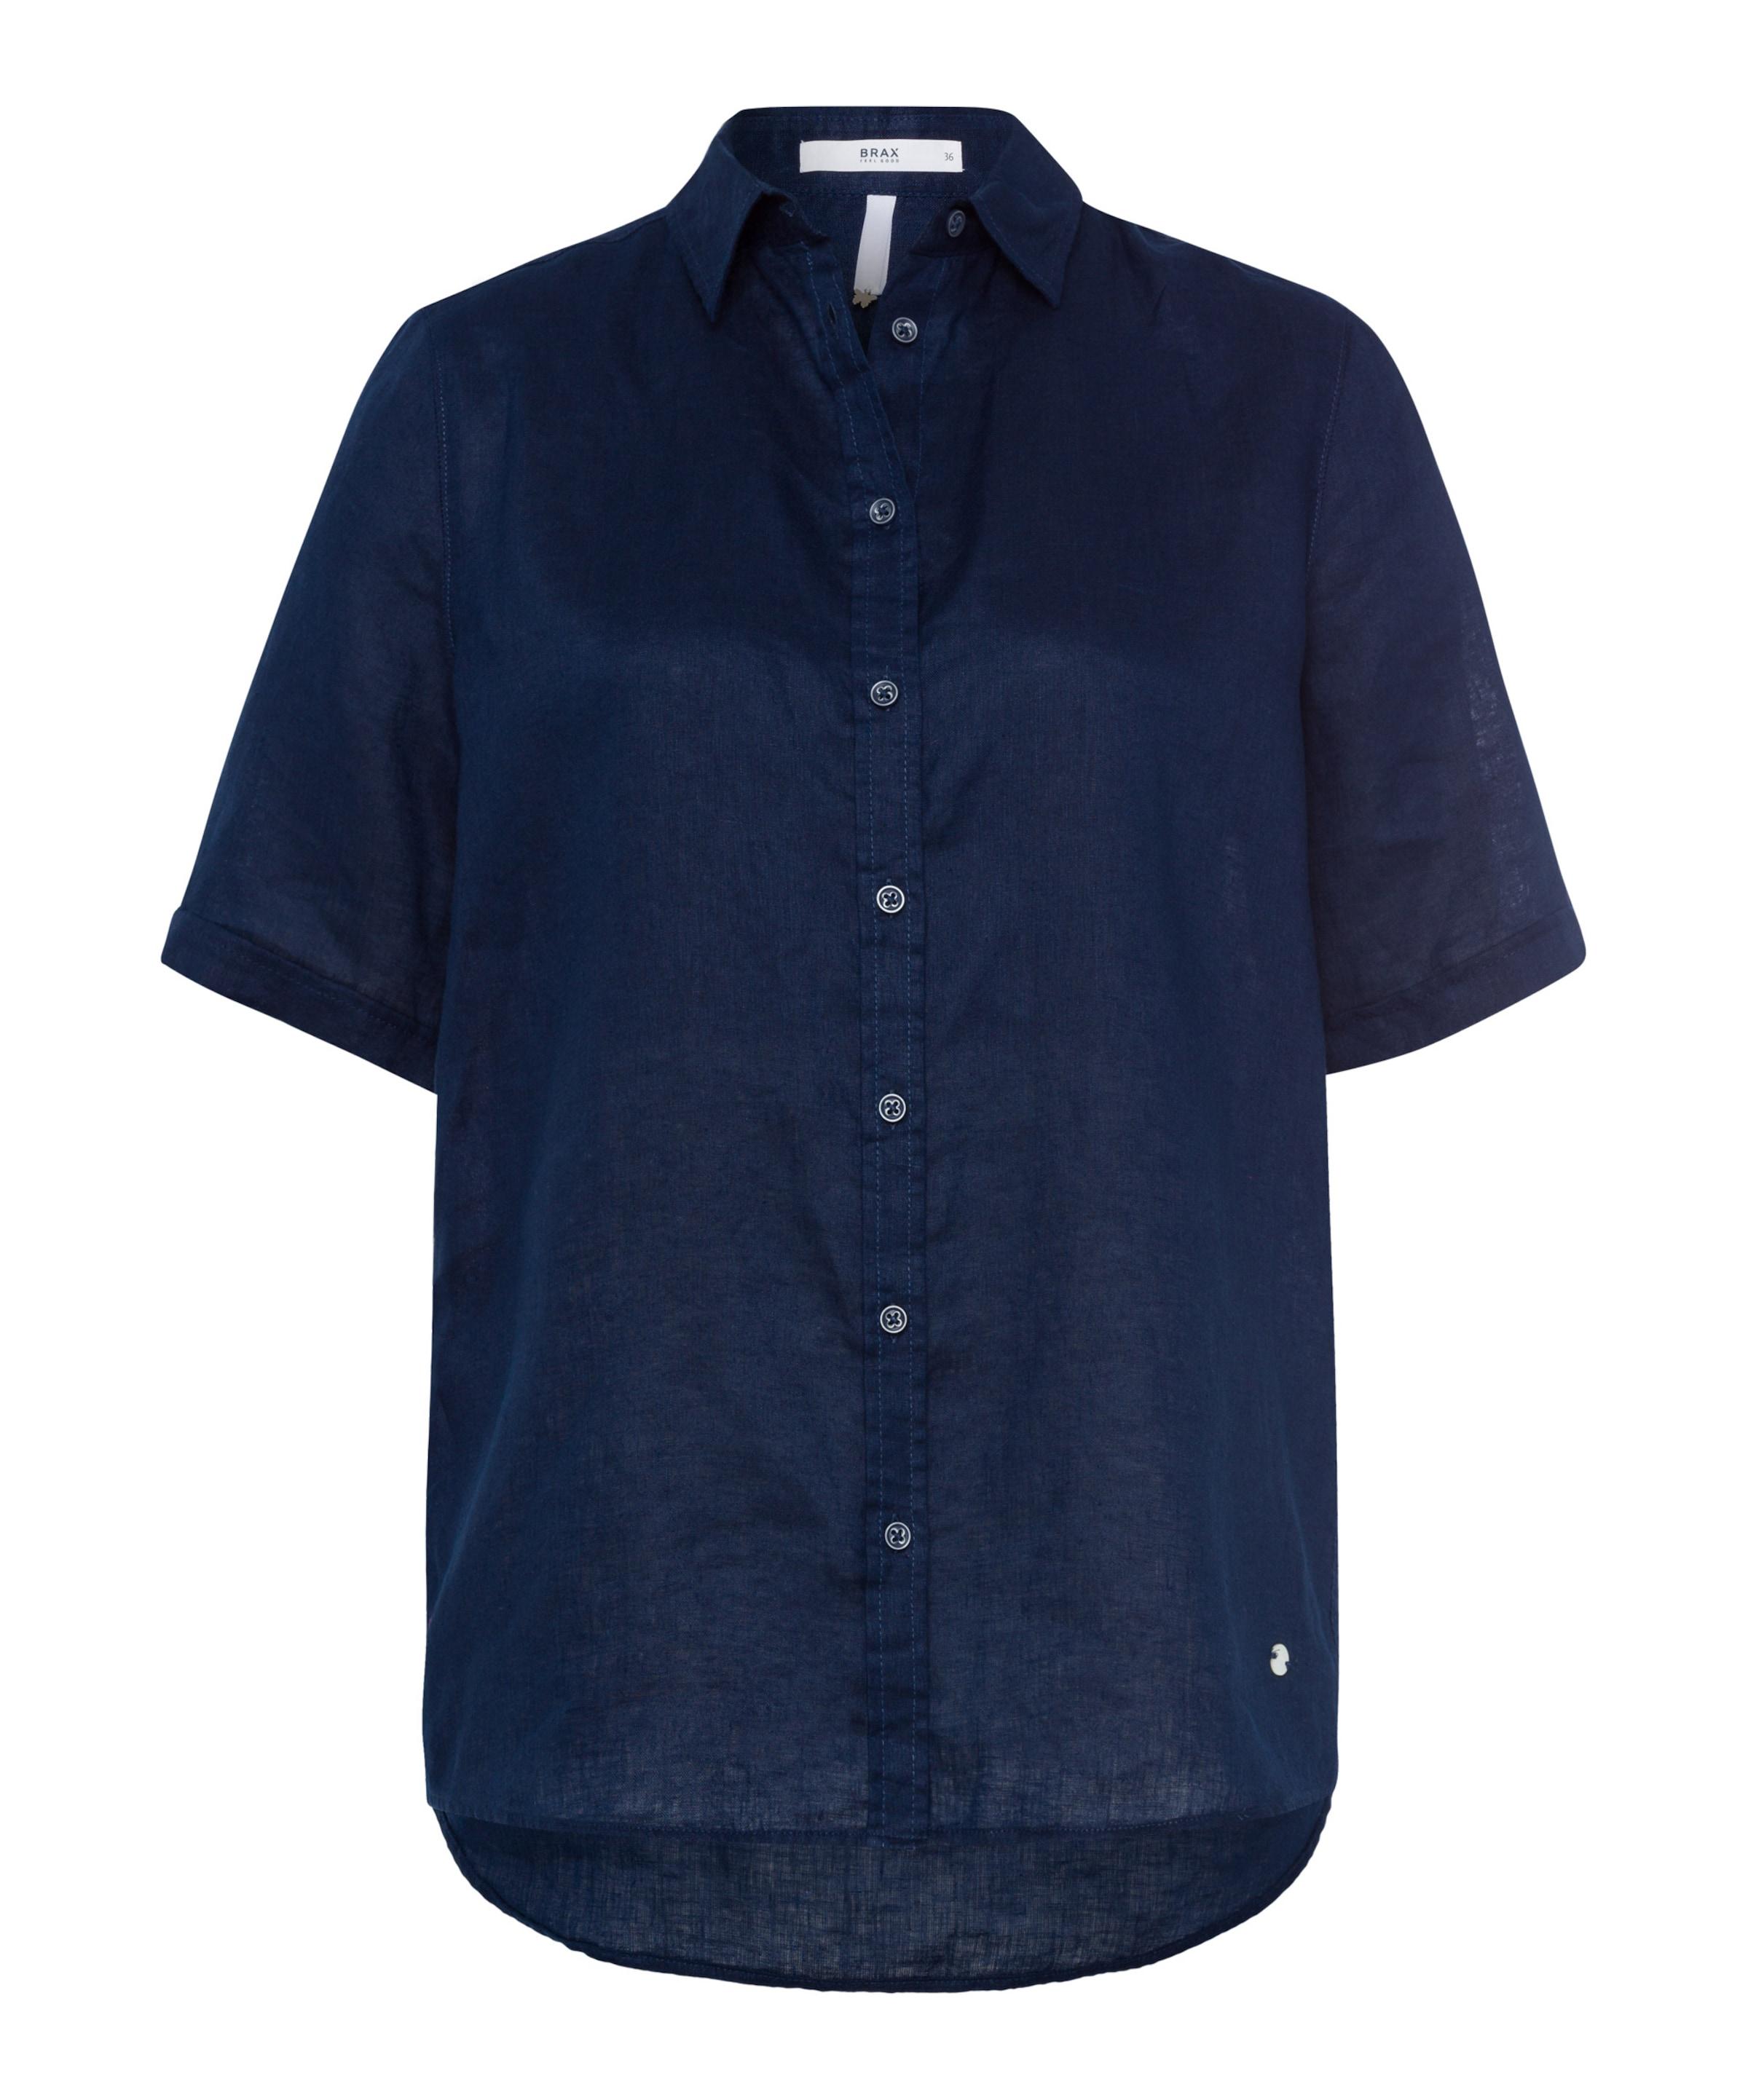 'viana' Brax Dunkelblau 'viana' In Dunkelblau Brax Bluse Bluse In Bluse Brax Y29beEWDIH